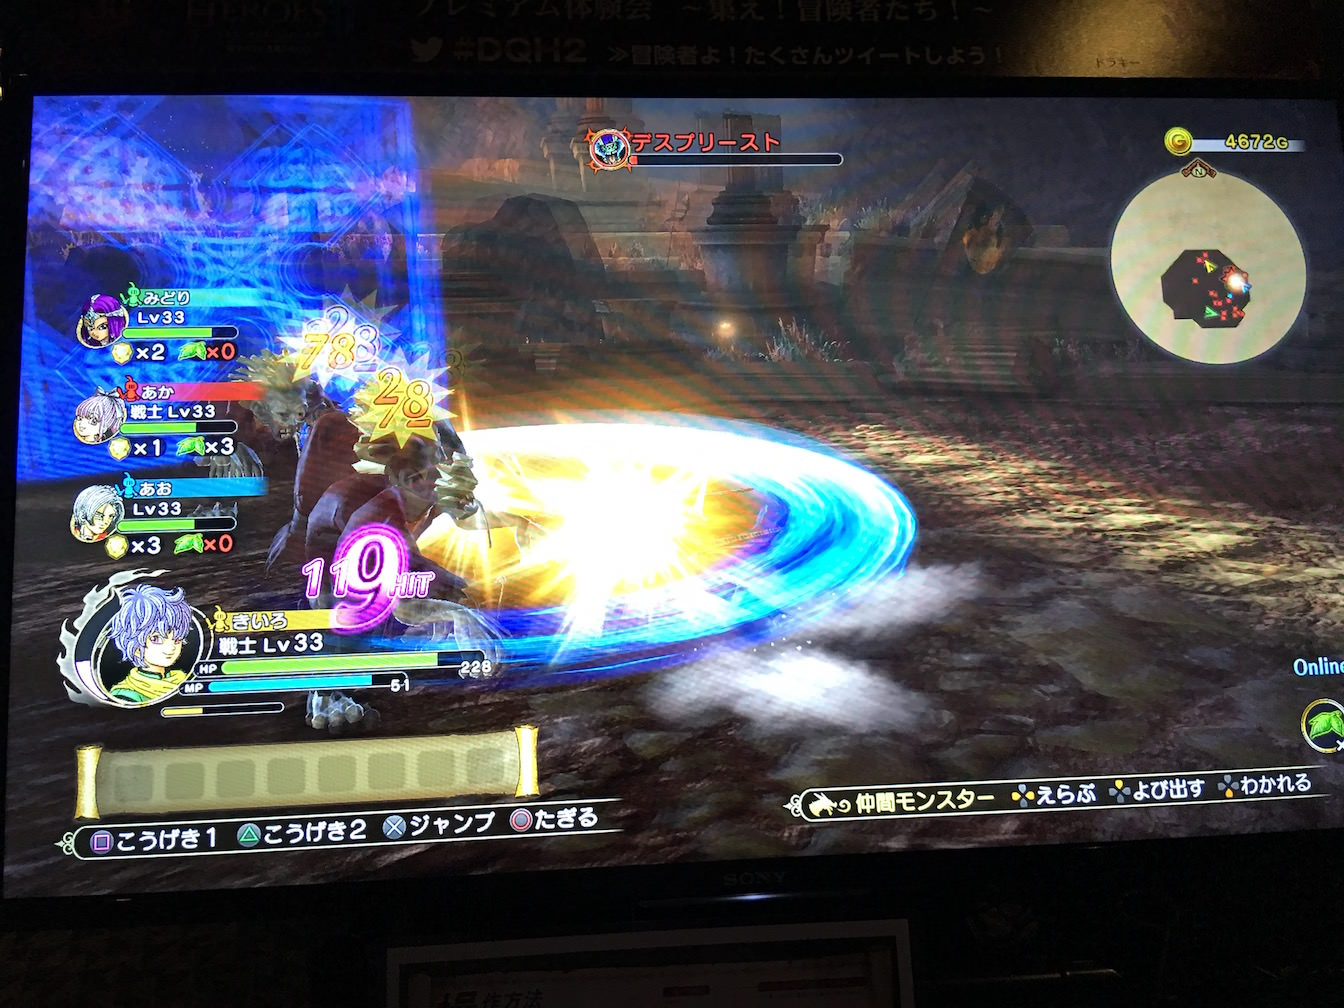 Dragon quest heros 2 premium experience meeting report 35